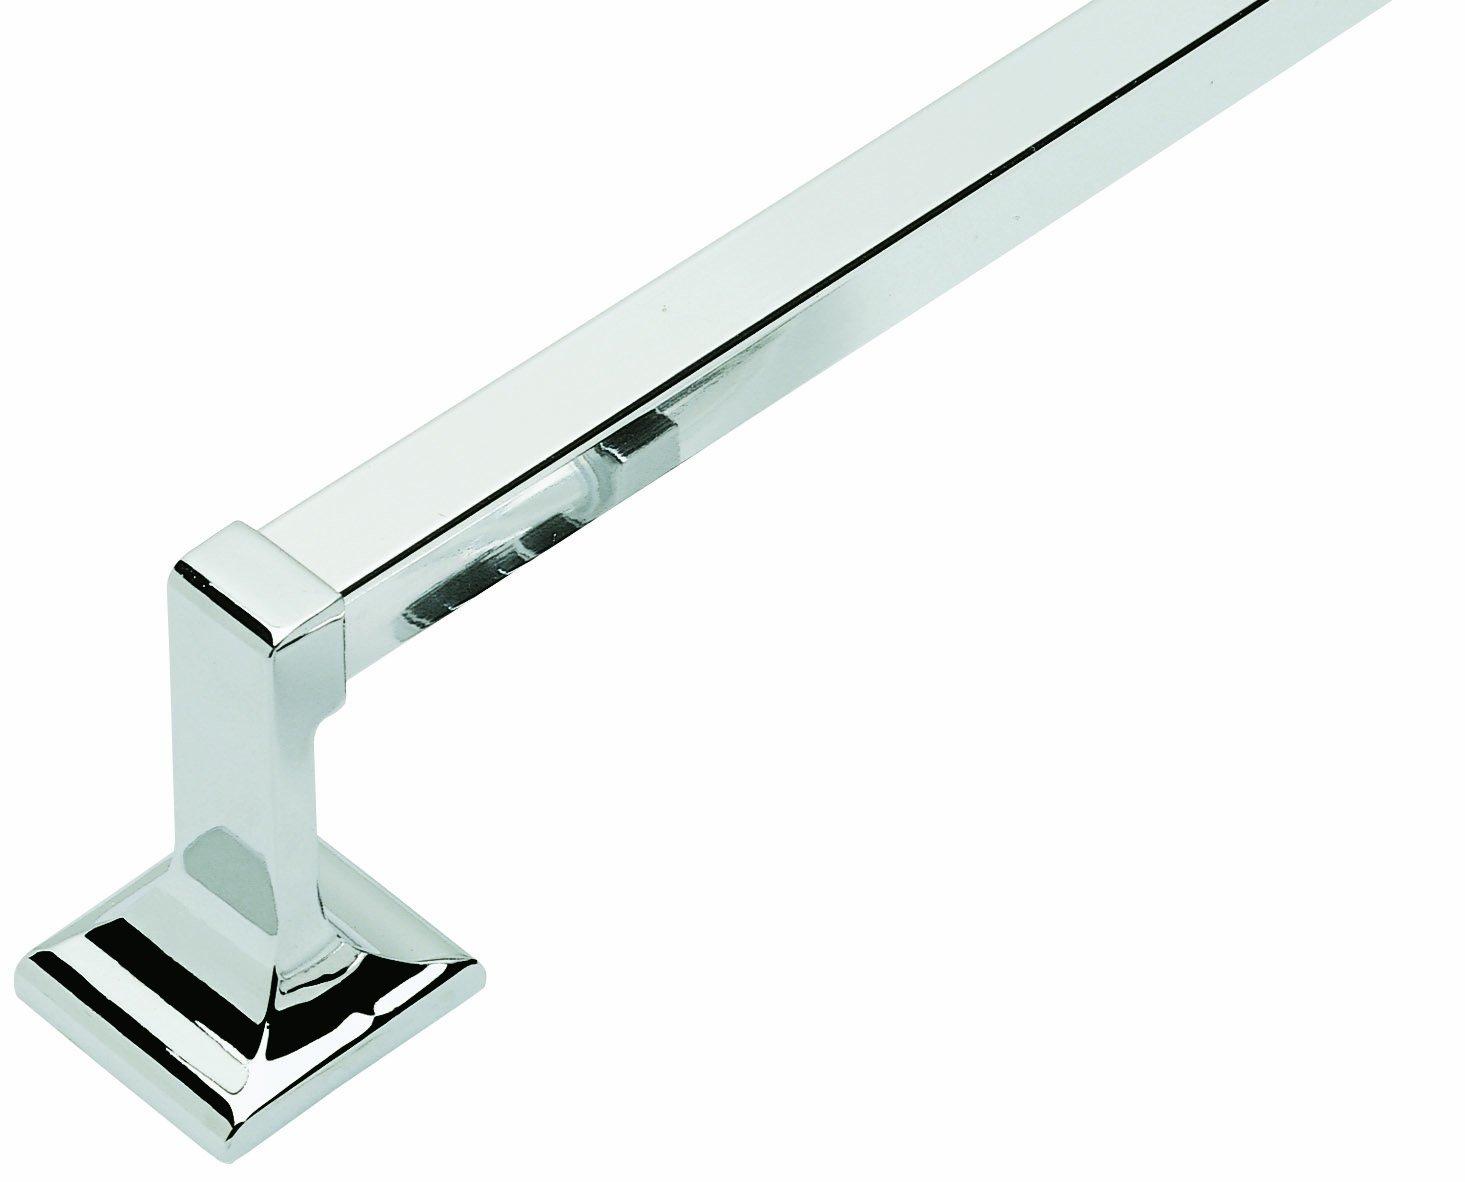 Design House 533026 Millbridge Towel Bar 24'', Polished Chrome